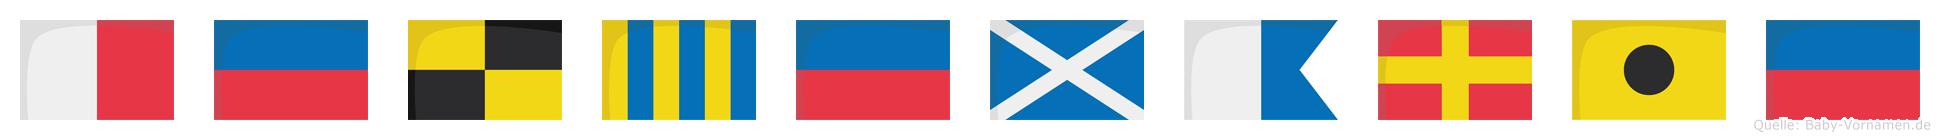 Helgemarie im Flaggenalphabet